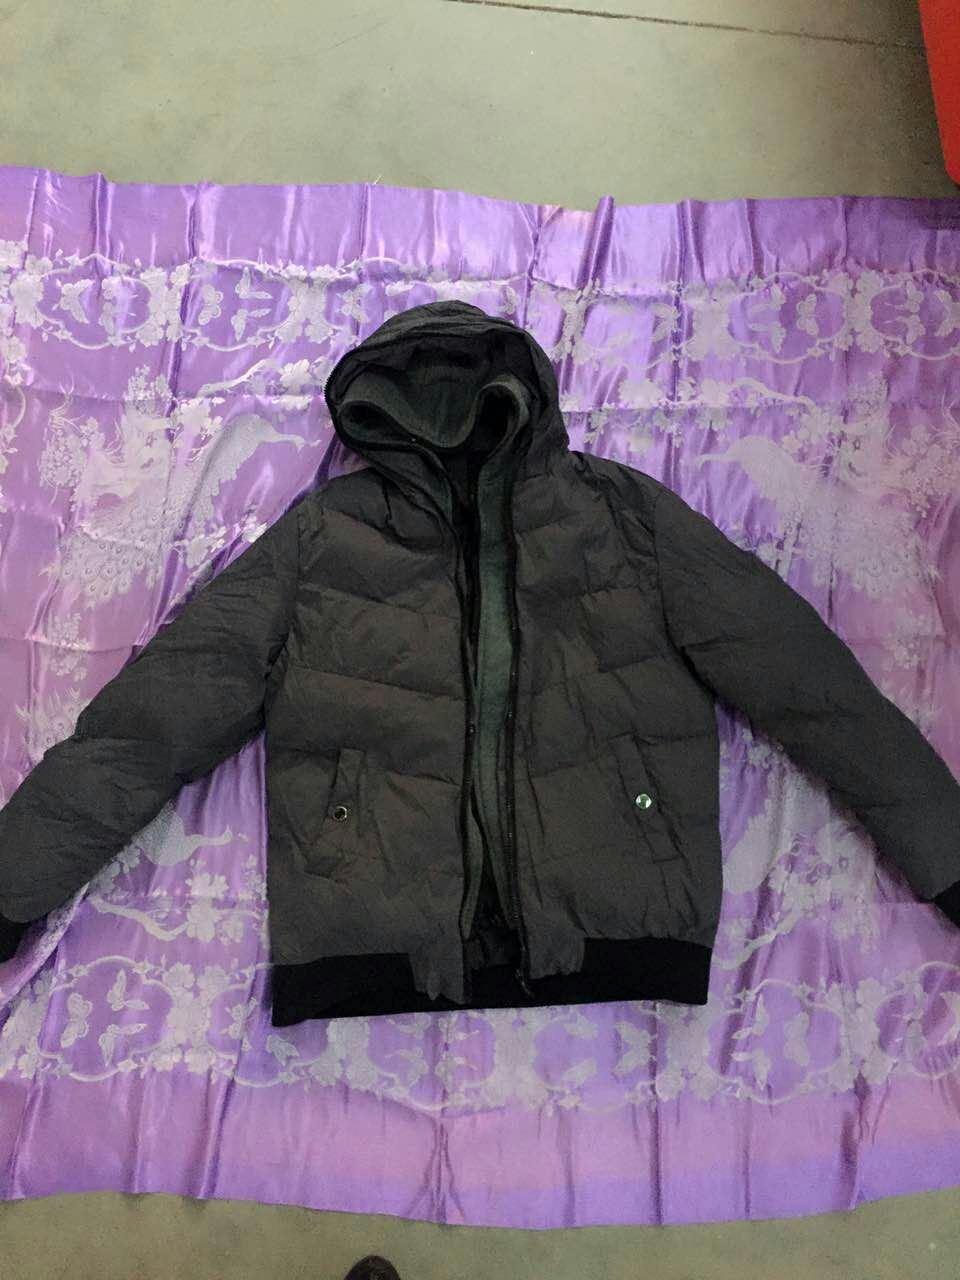 cb42eb67b62 China Premium Quality Grade AAA Second Hand Winter Clothing Used Warm  Clothing - China Second Hand Winter Clothing